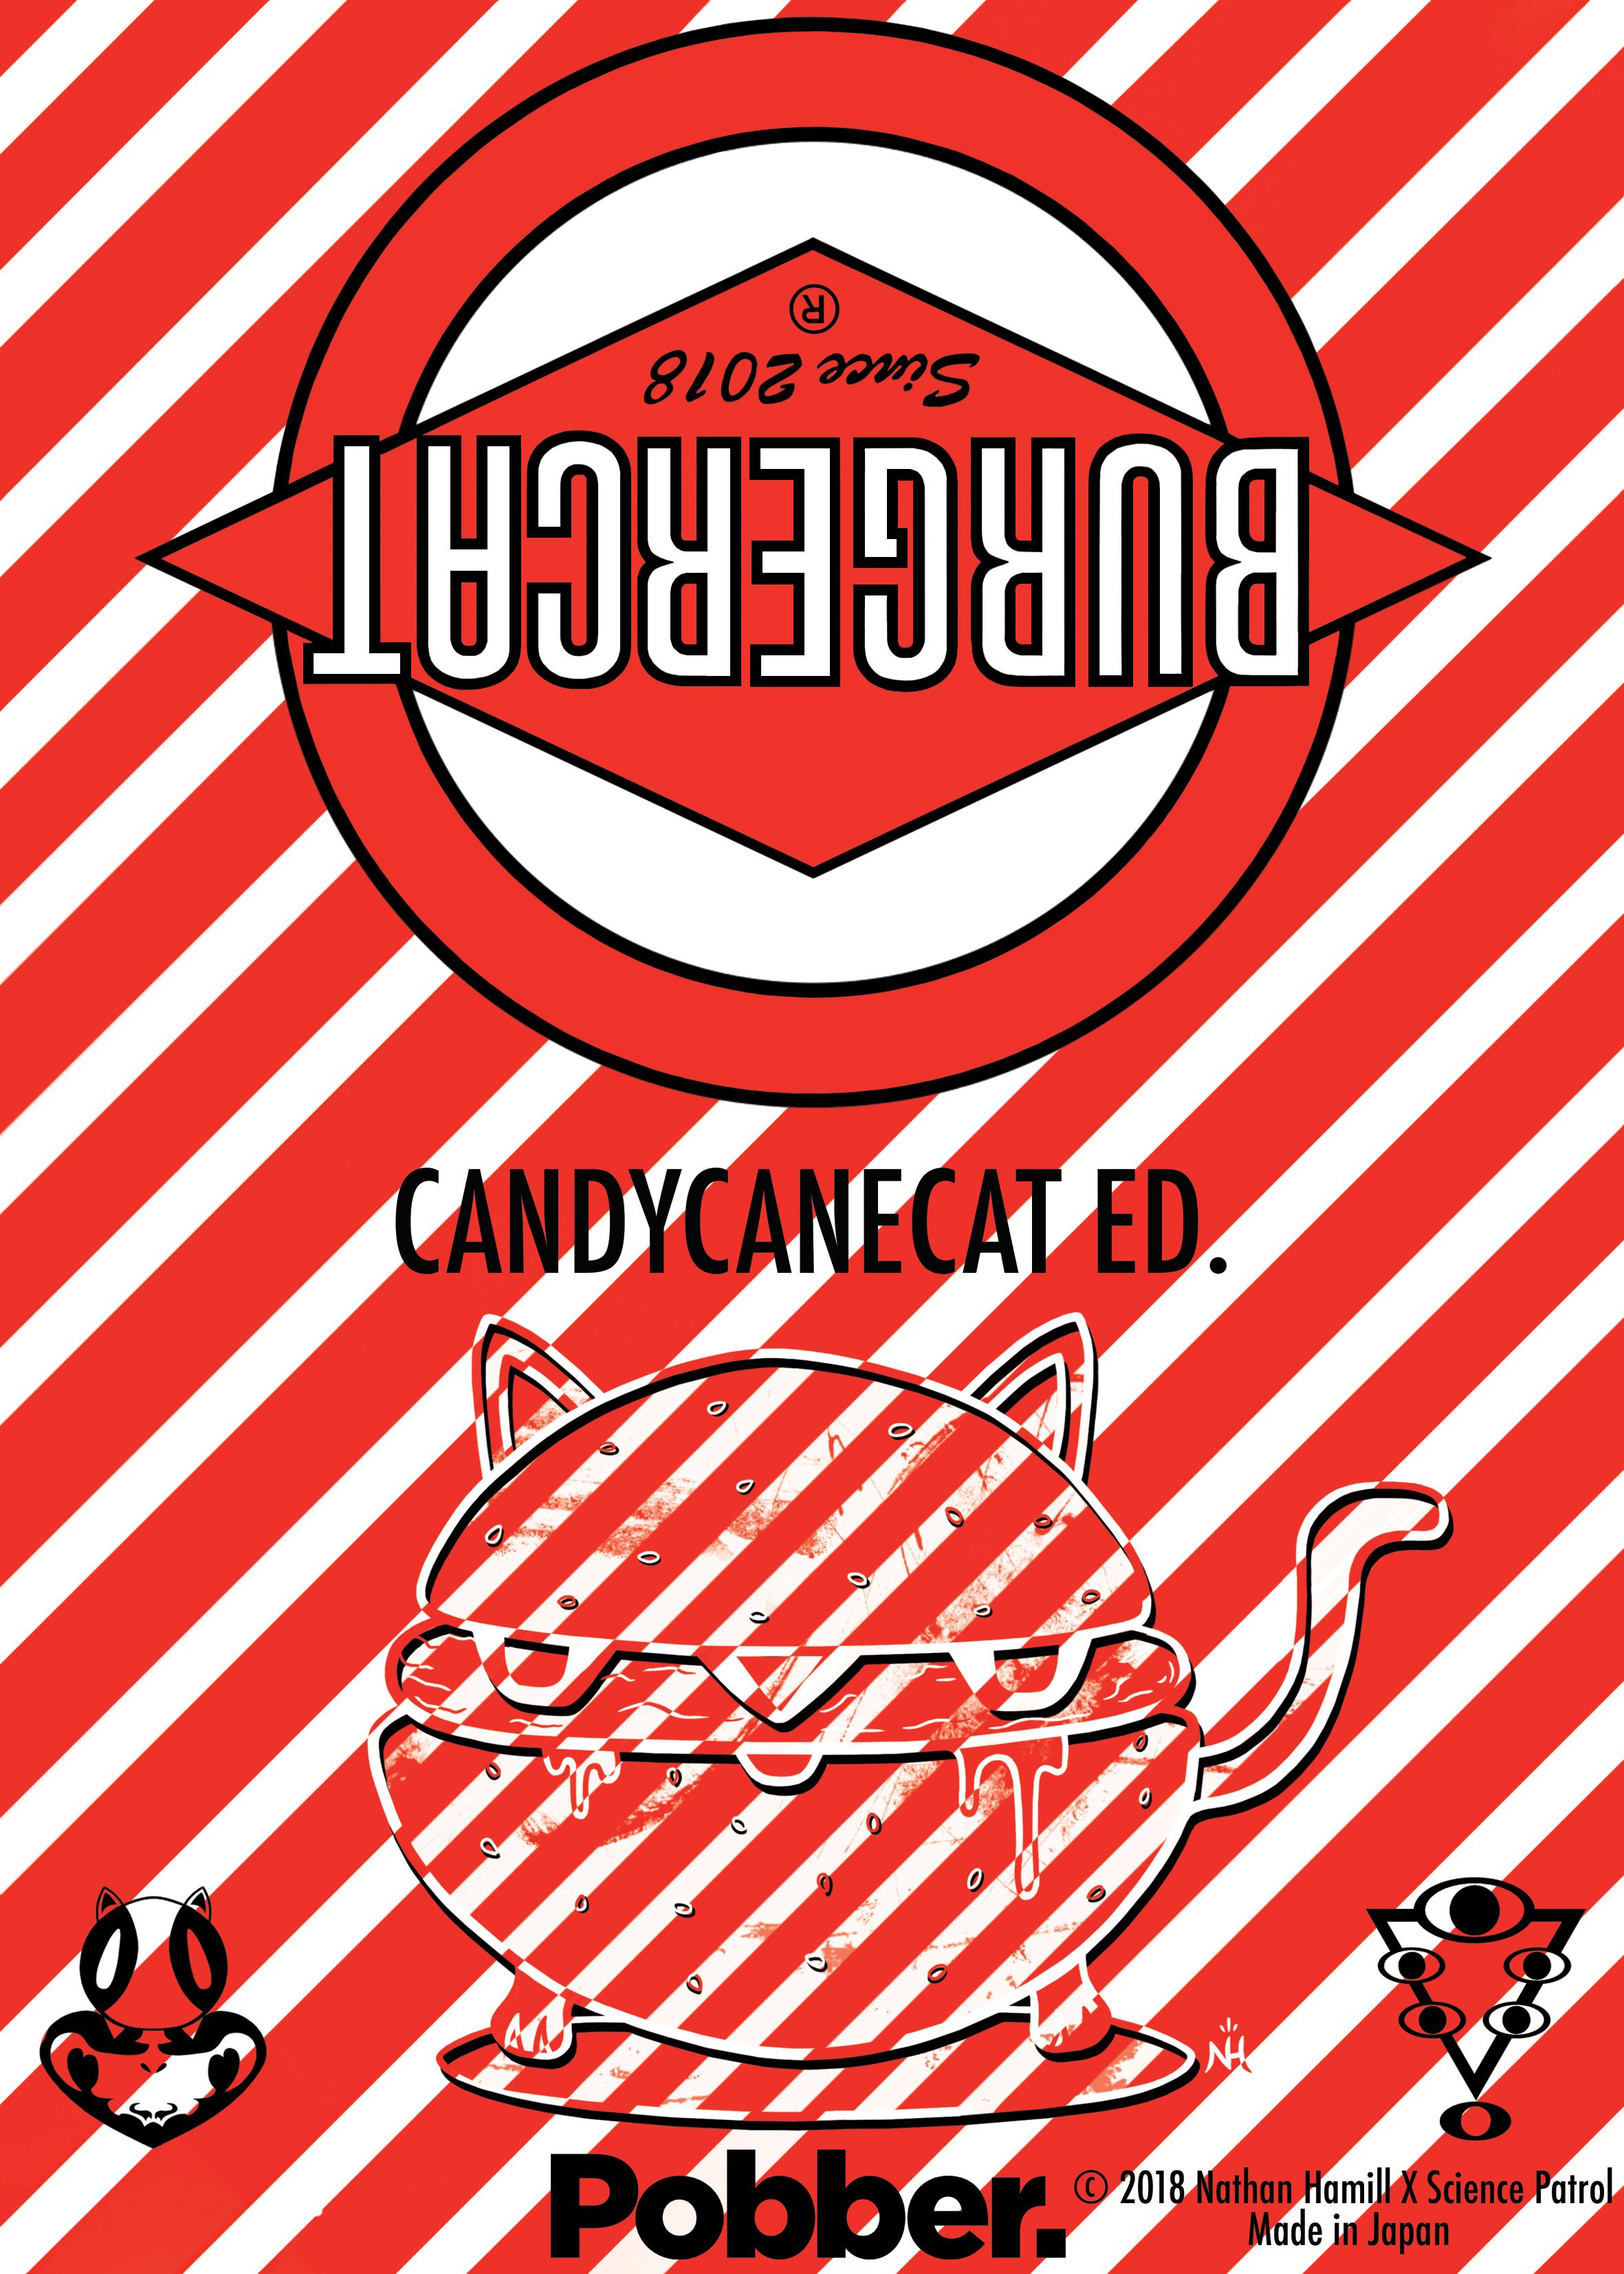 BurgerCat: CandyCaneCatEd.